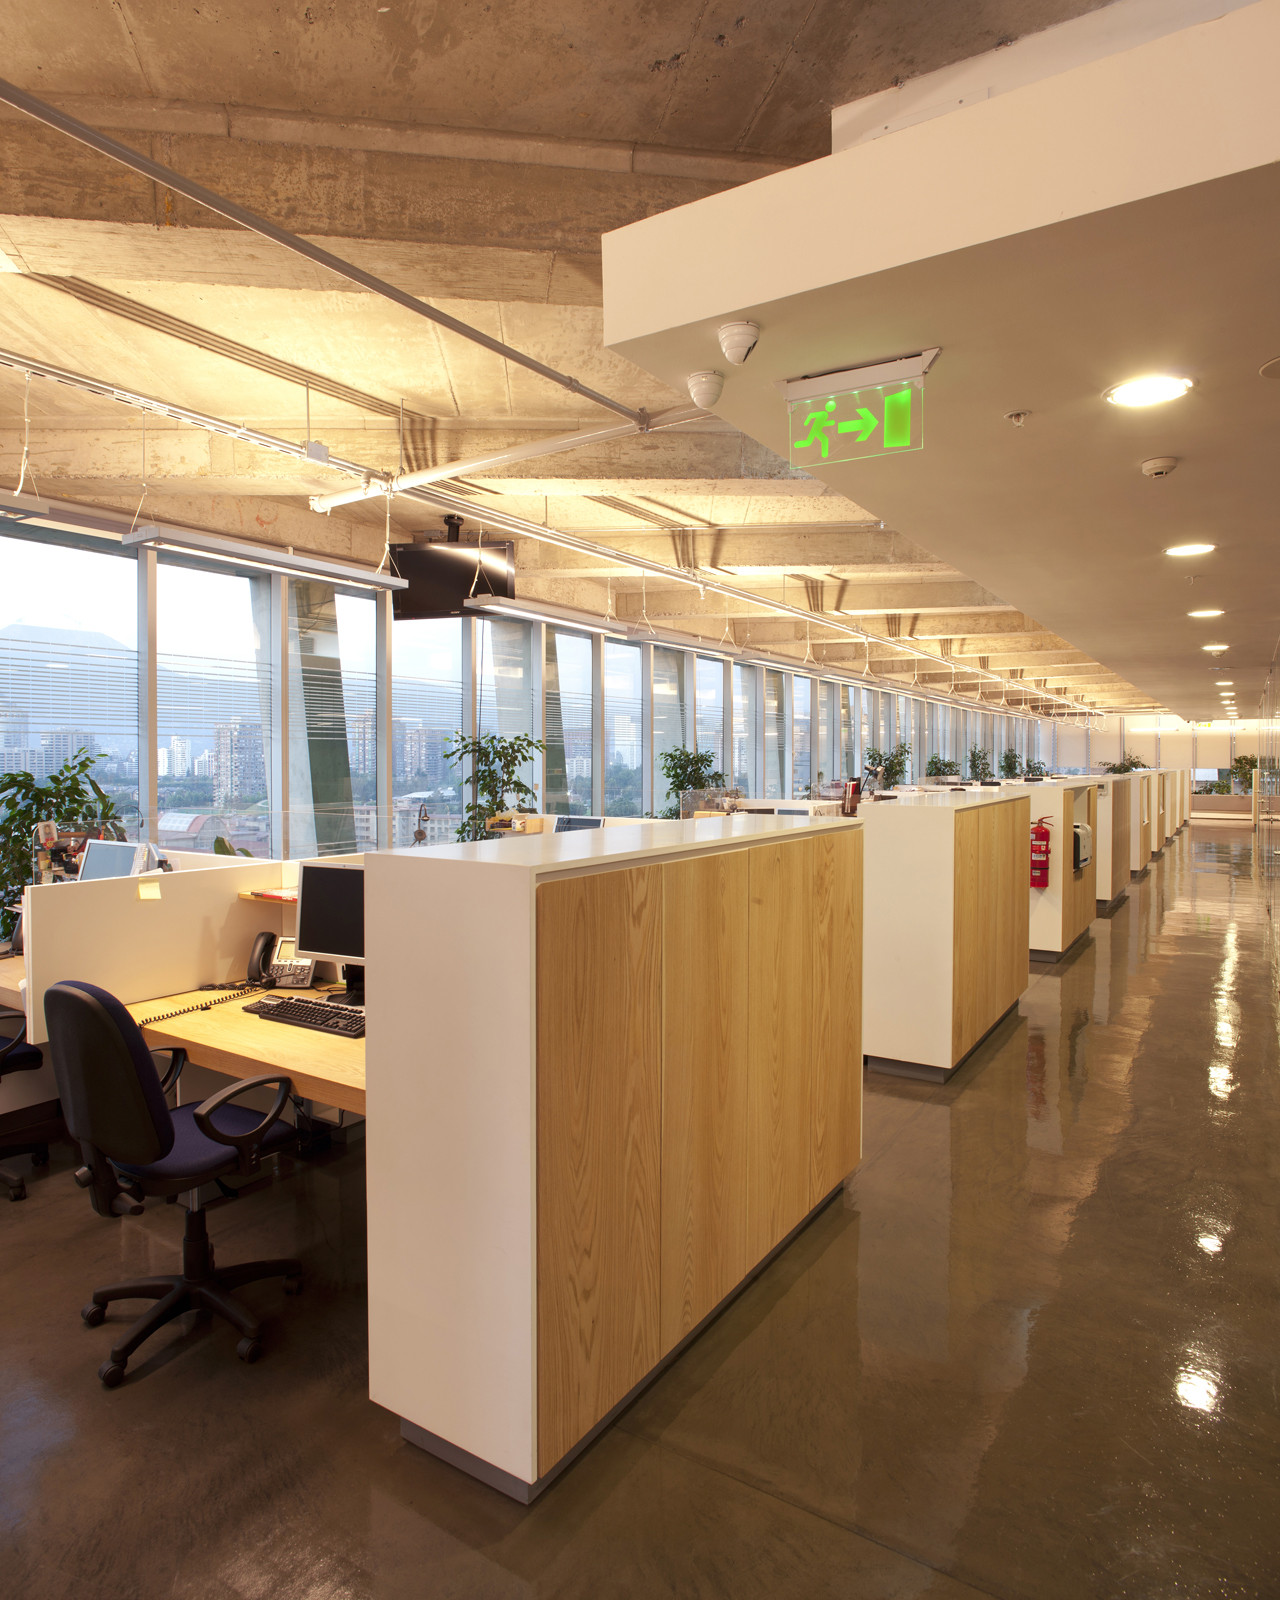 Galer a de oficinas hilti chile chauriye st ger for Busco arquitecto